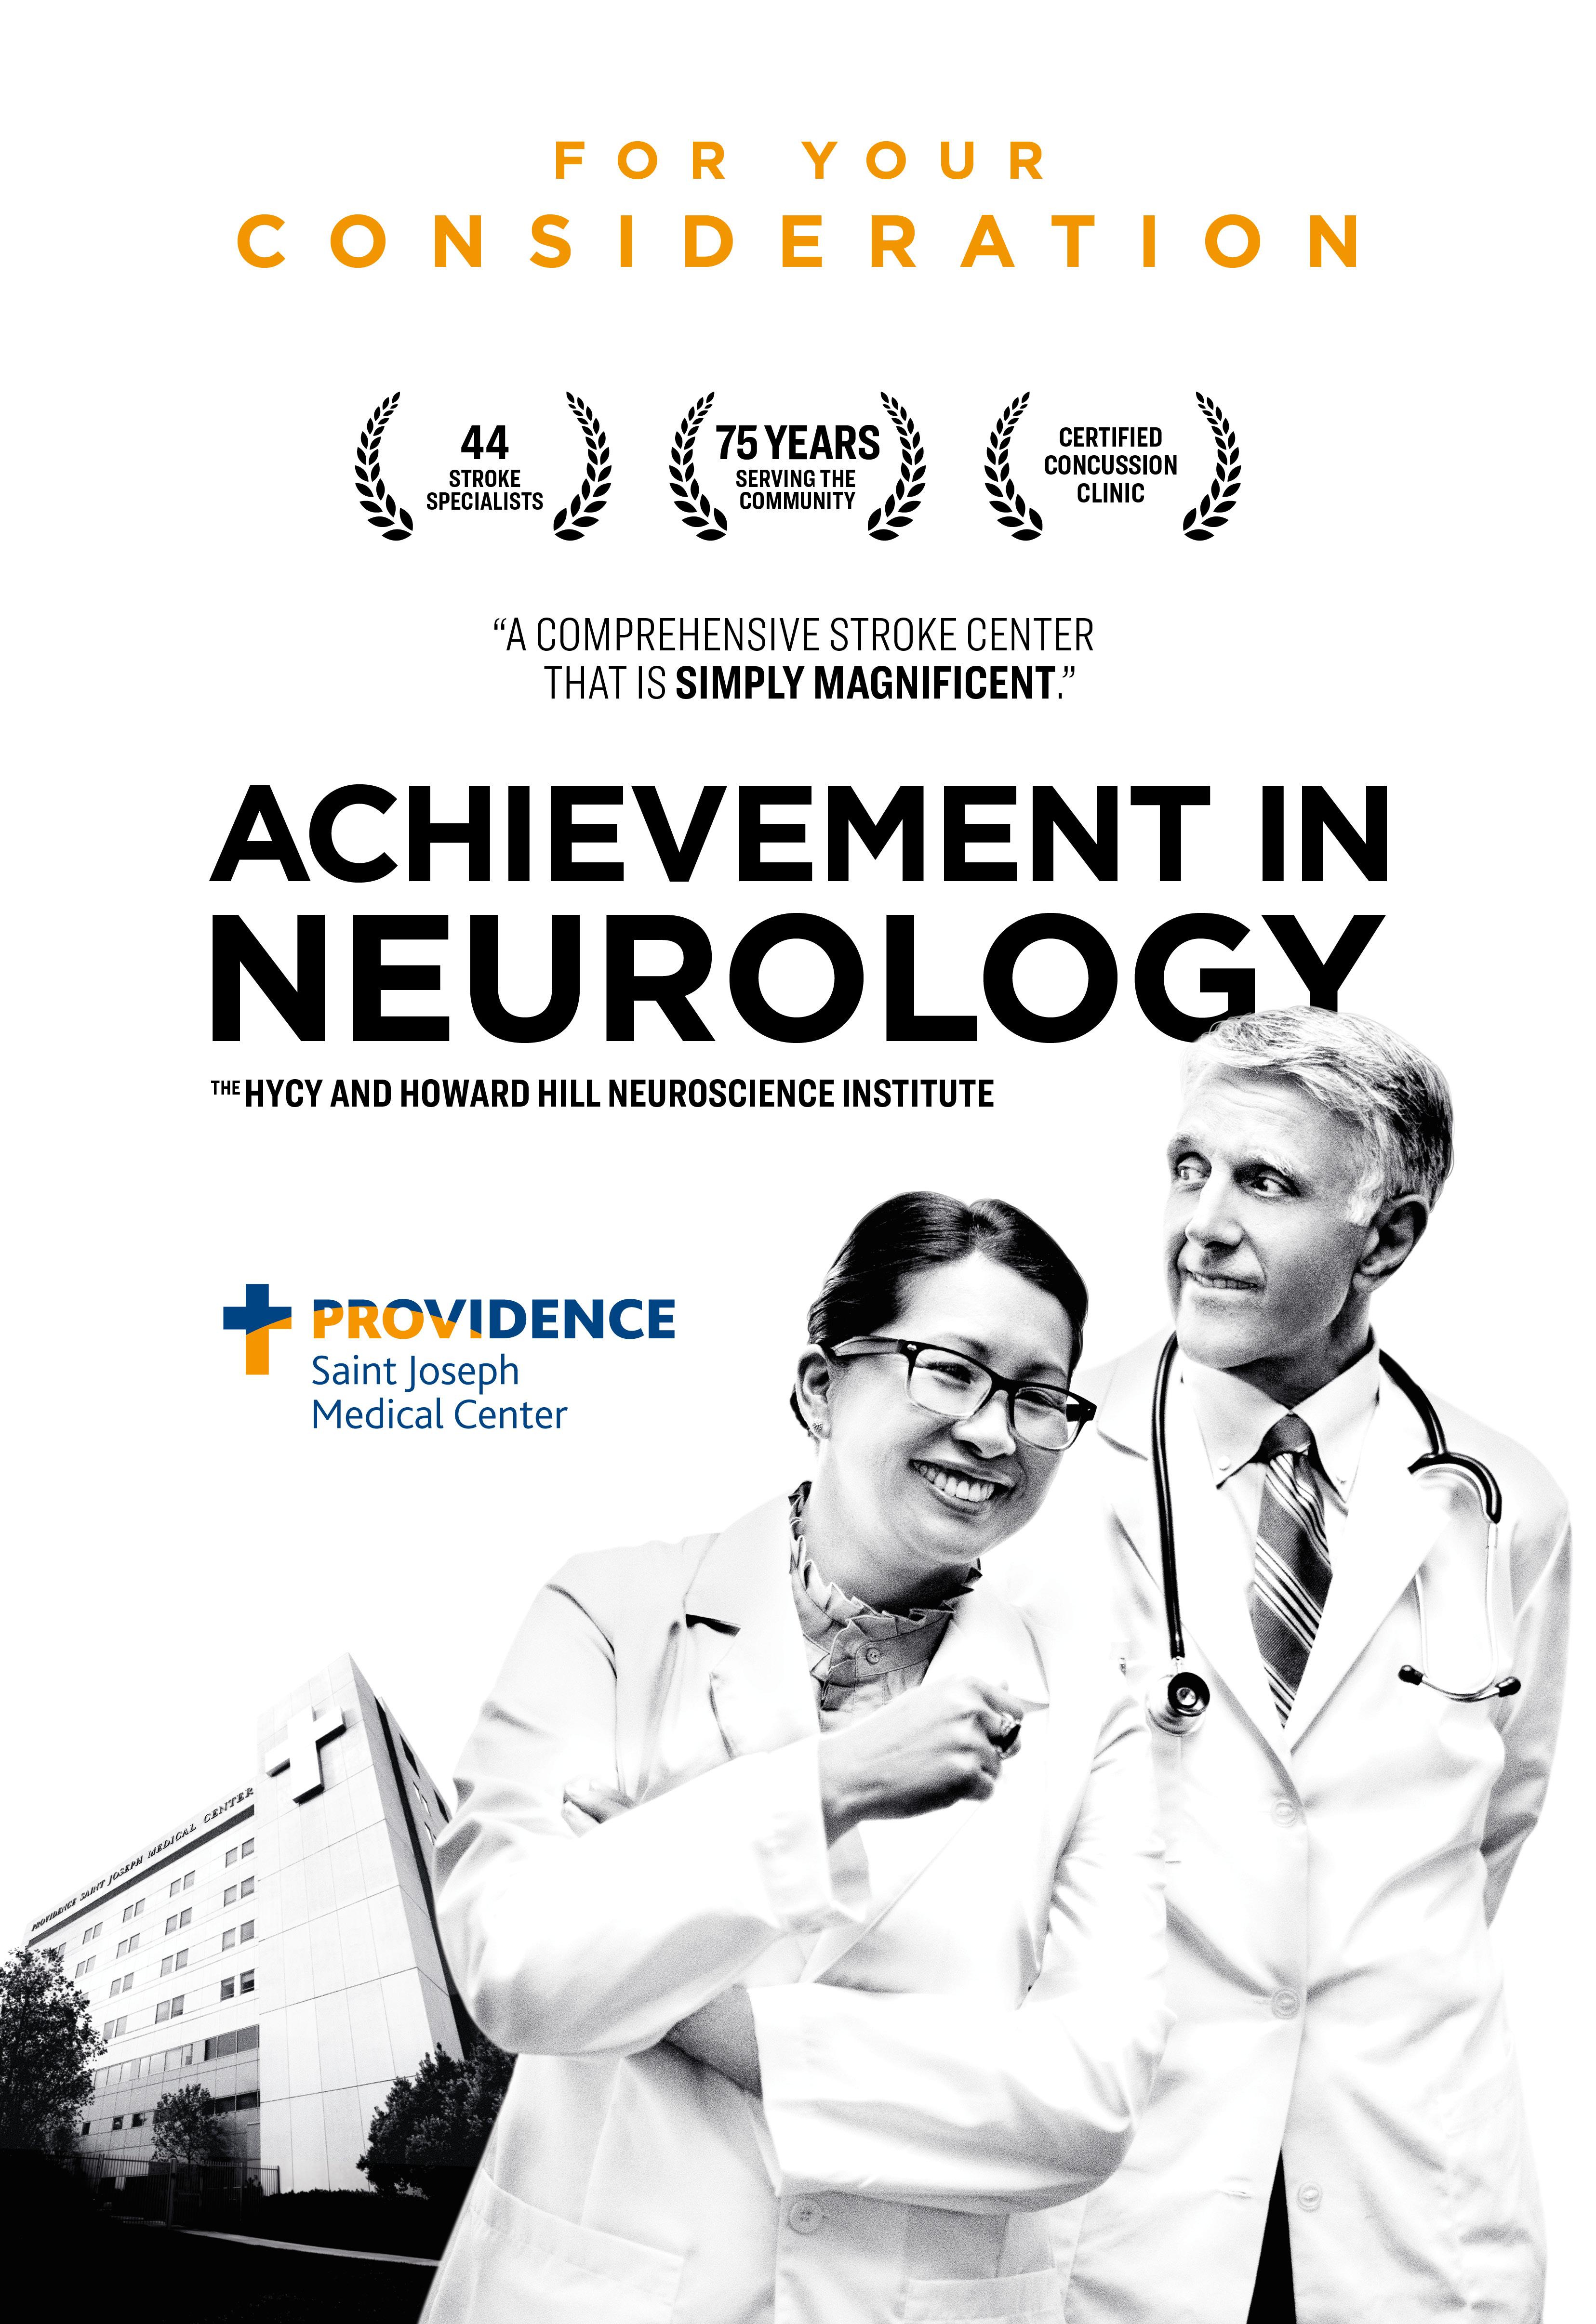 Providence_CCO_LA_TransitShelter_Neurology_69x48_NE_010219